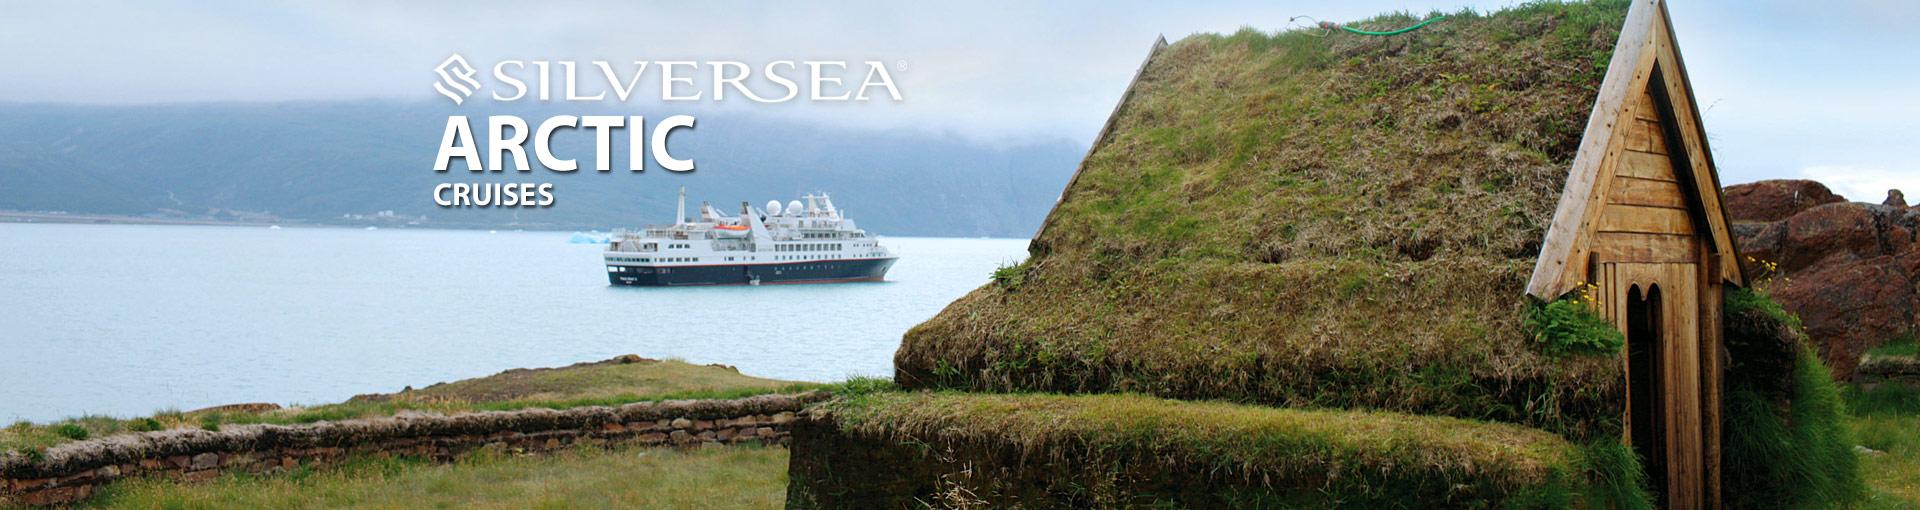 Silversea Cruises Arctic Cruises